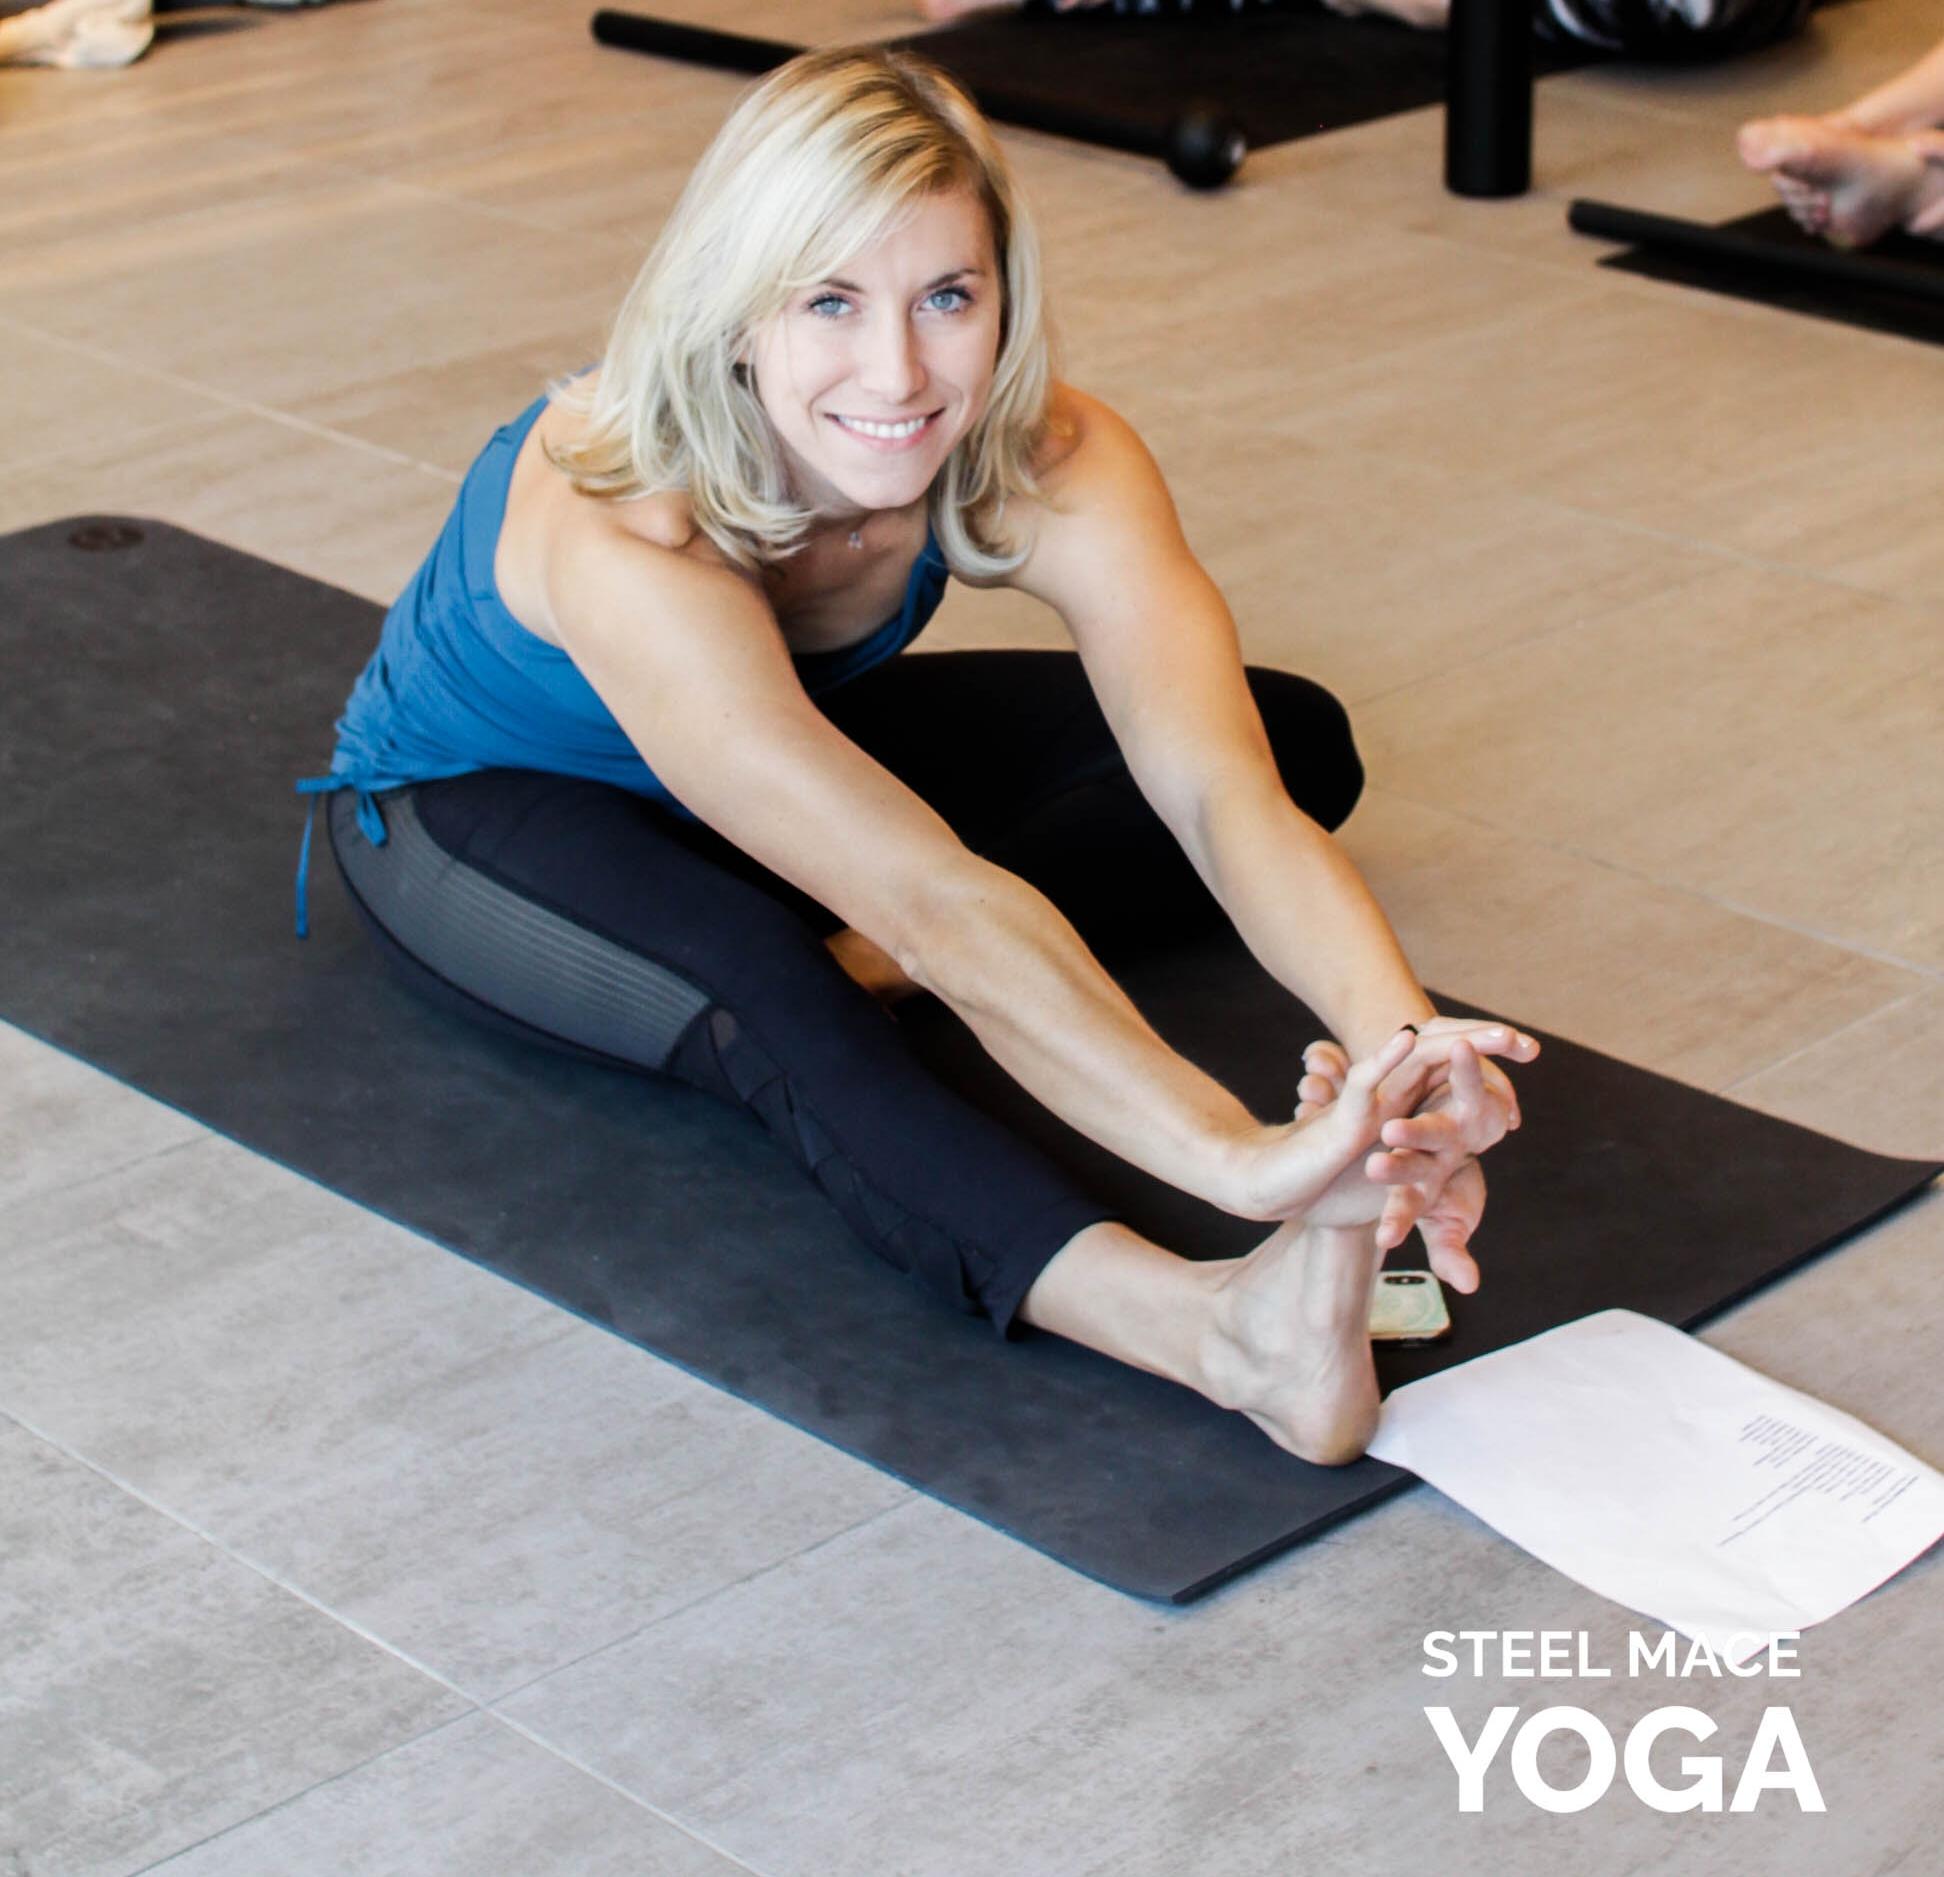 Erin-Furry-Steel-Mace-Yoga